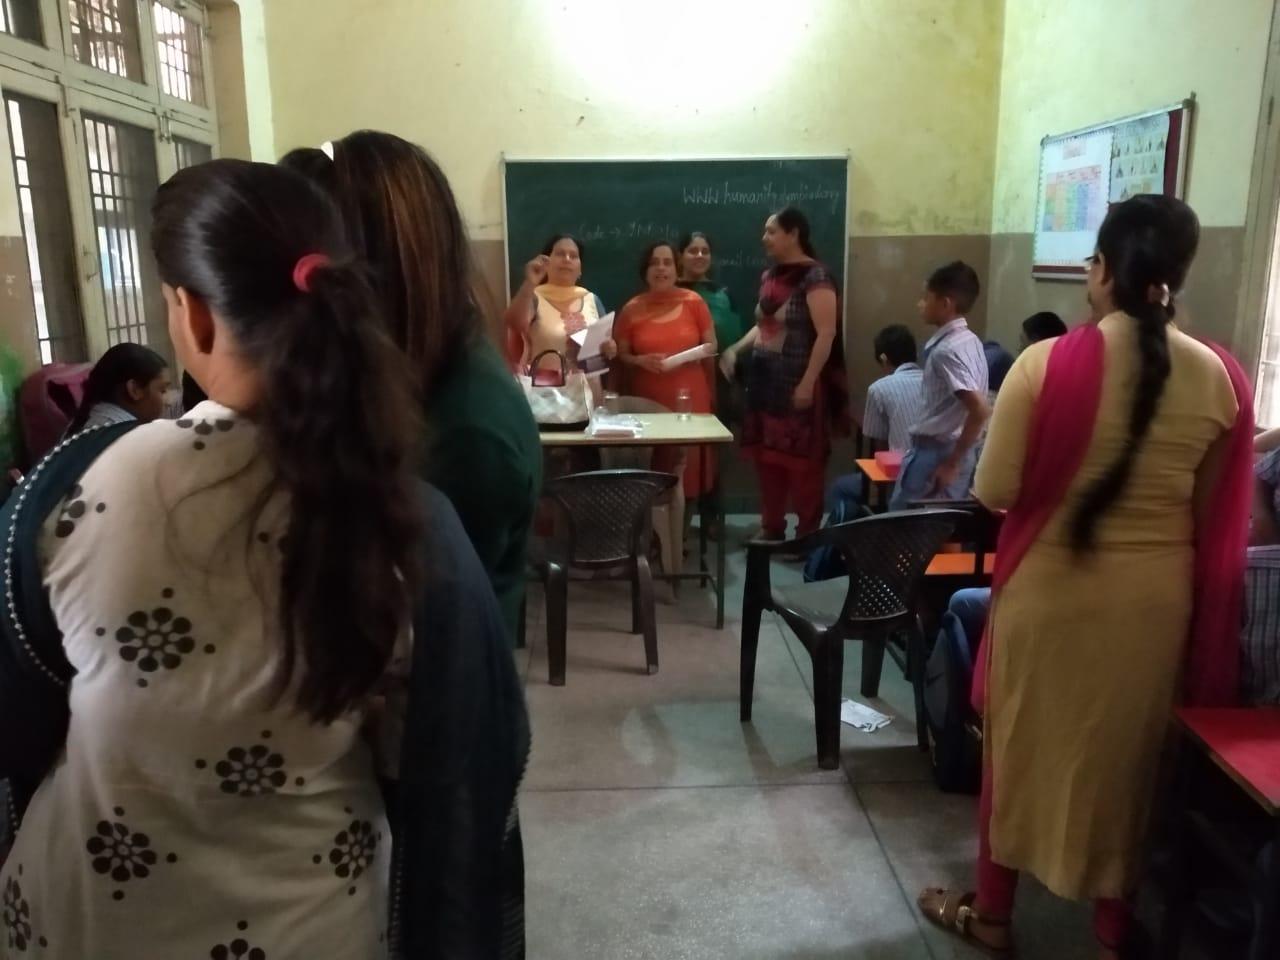 Shri Guru hari krishan pubic school, YNR.jpeg